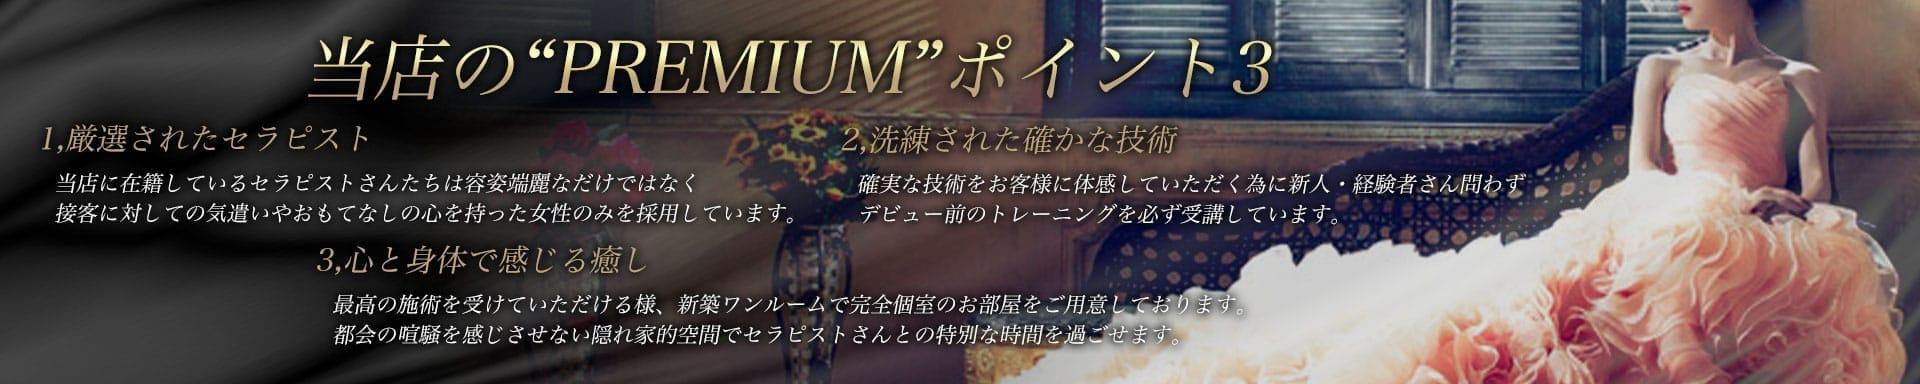 PREMIUM-プレミアム- その3